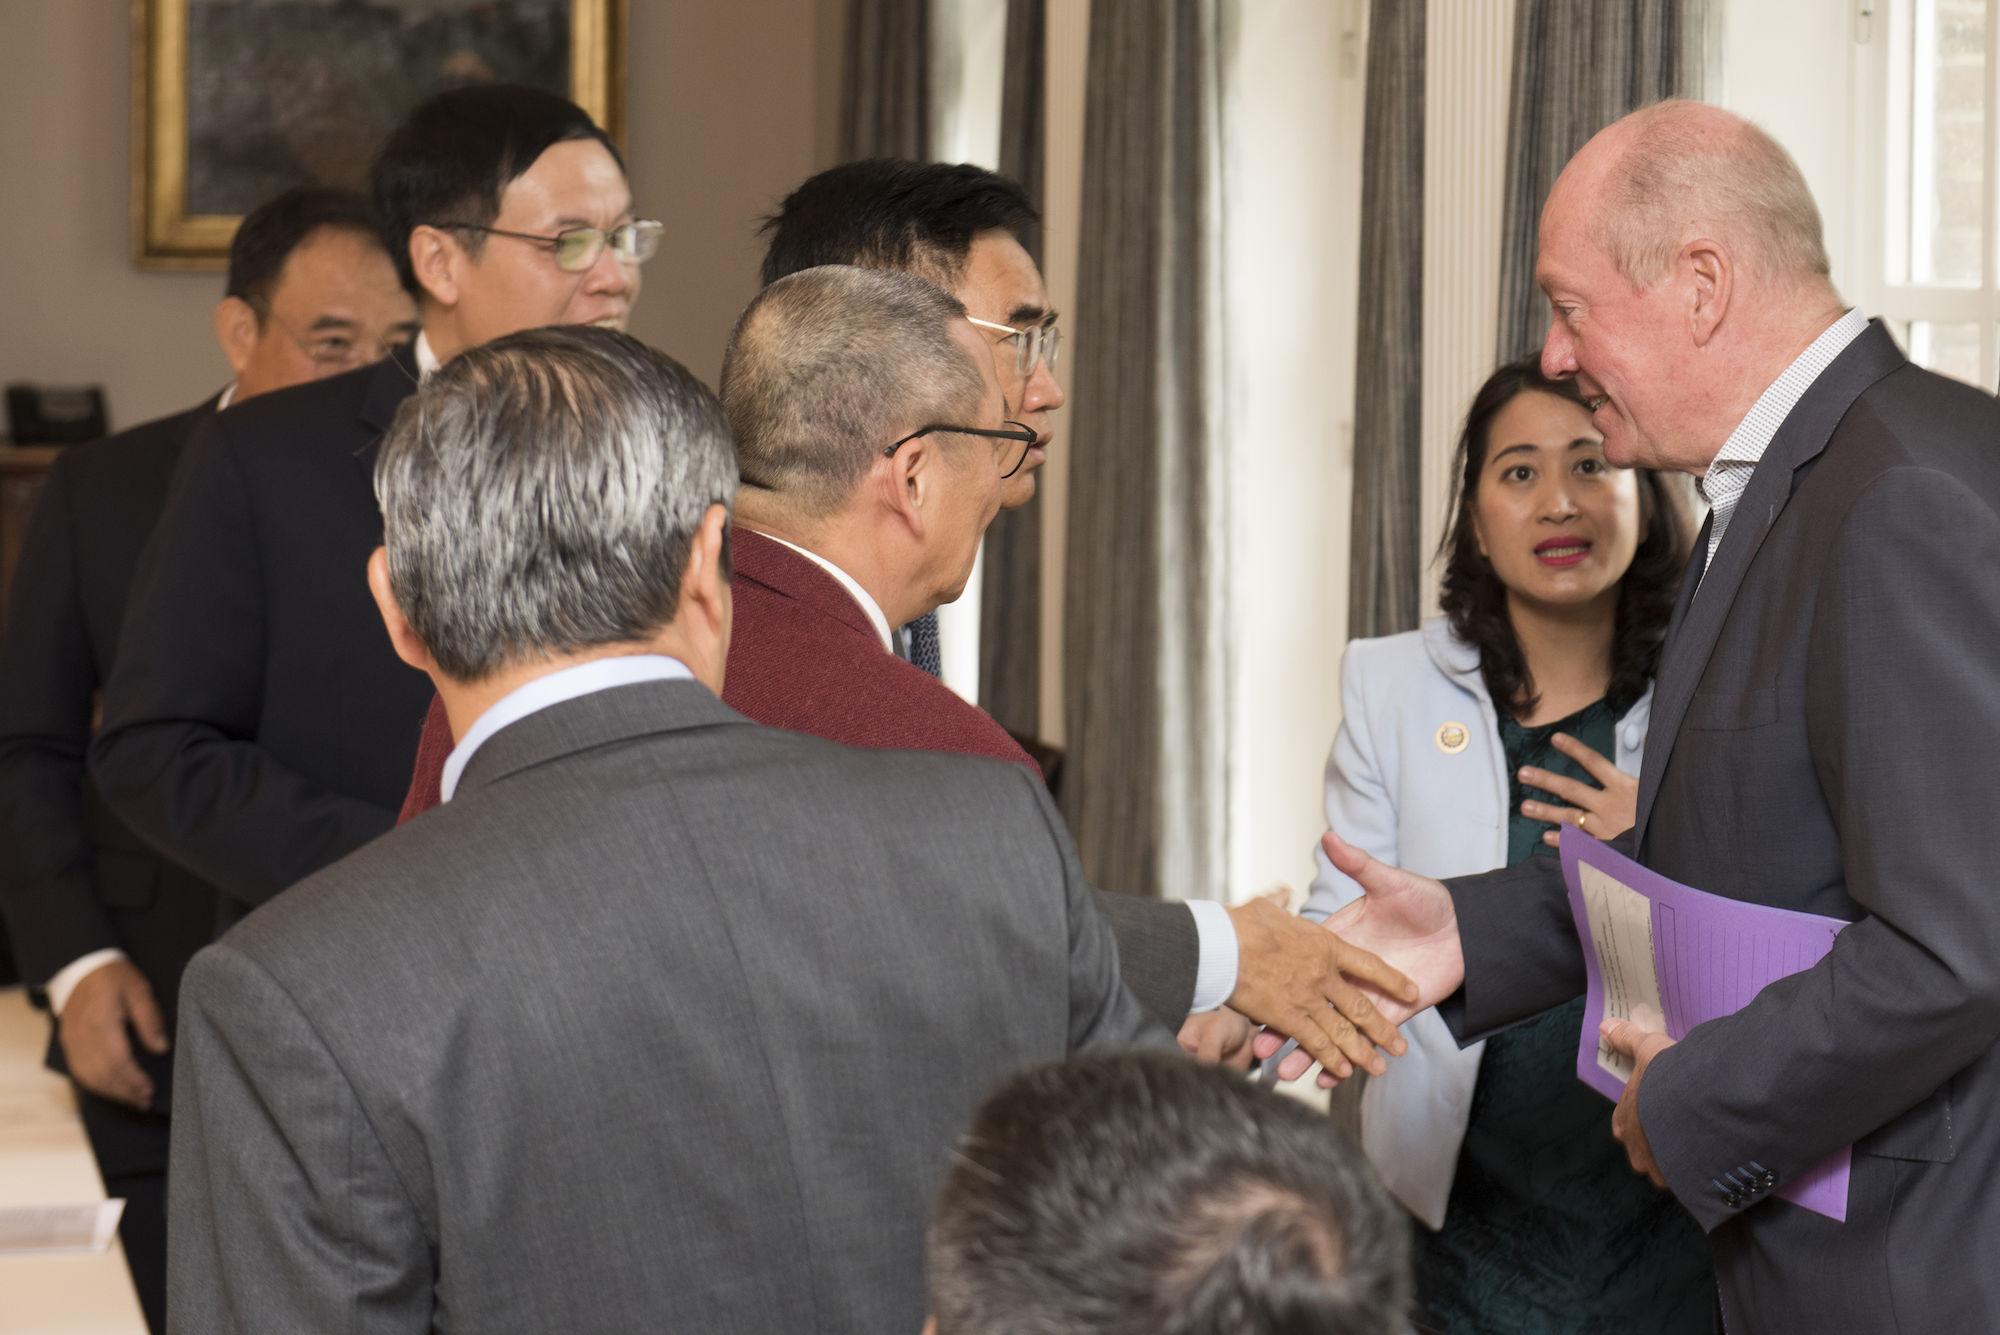 180910 Delegation from Dong Nai Province Vietnam 00010.jpg